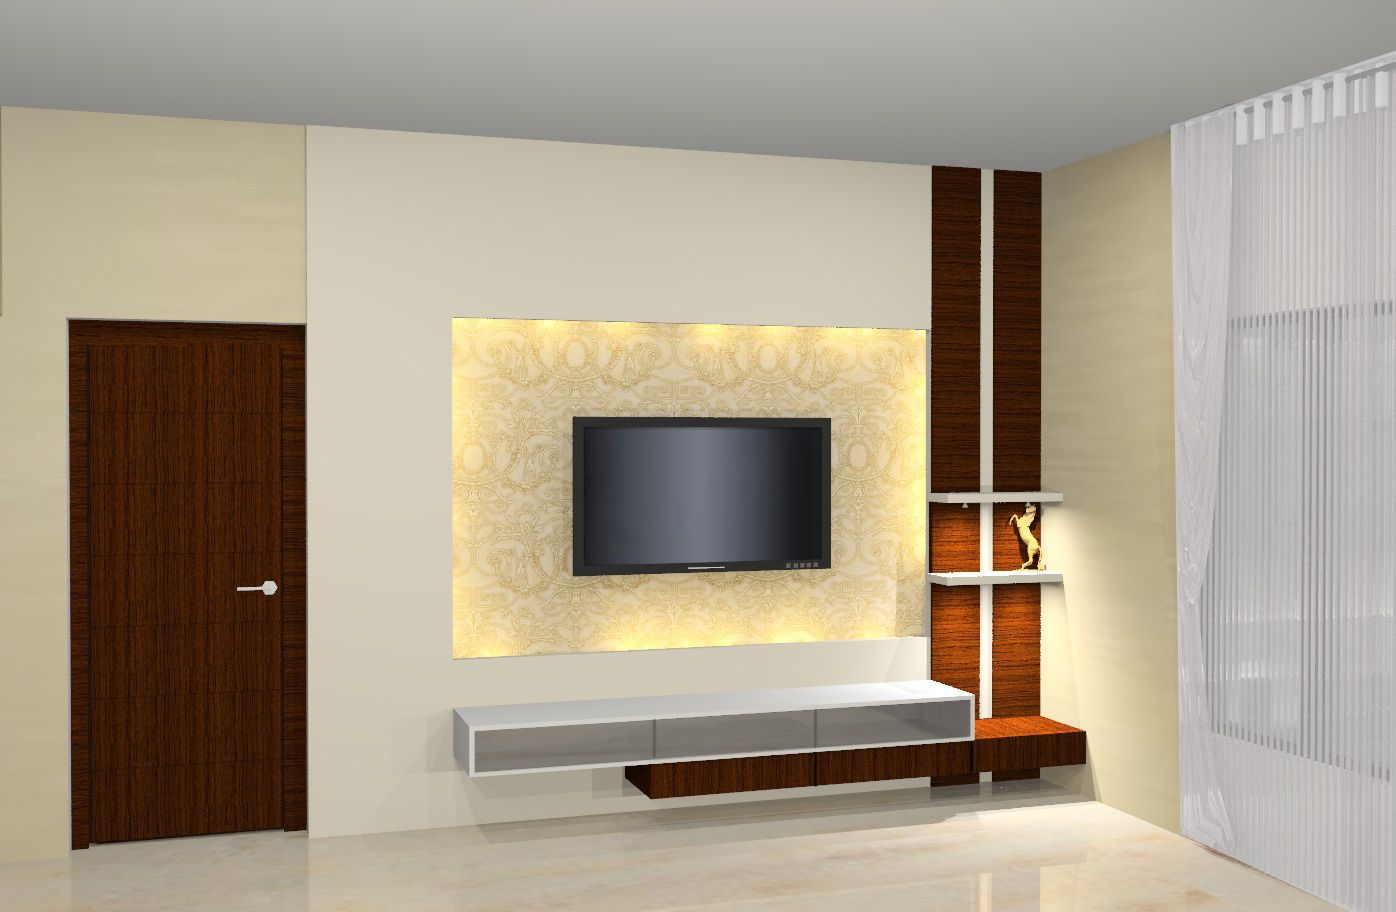 Interior Design Ideas With Tv Unit Wall Unit Designs Modern Tv